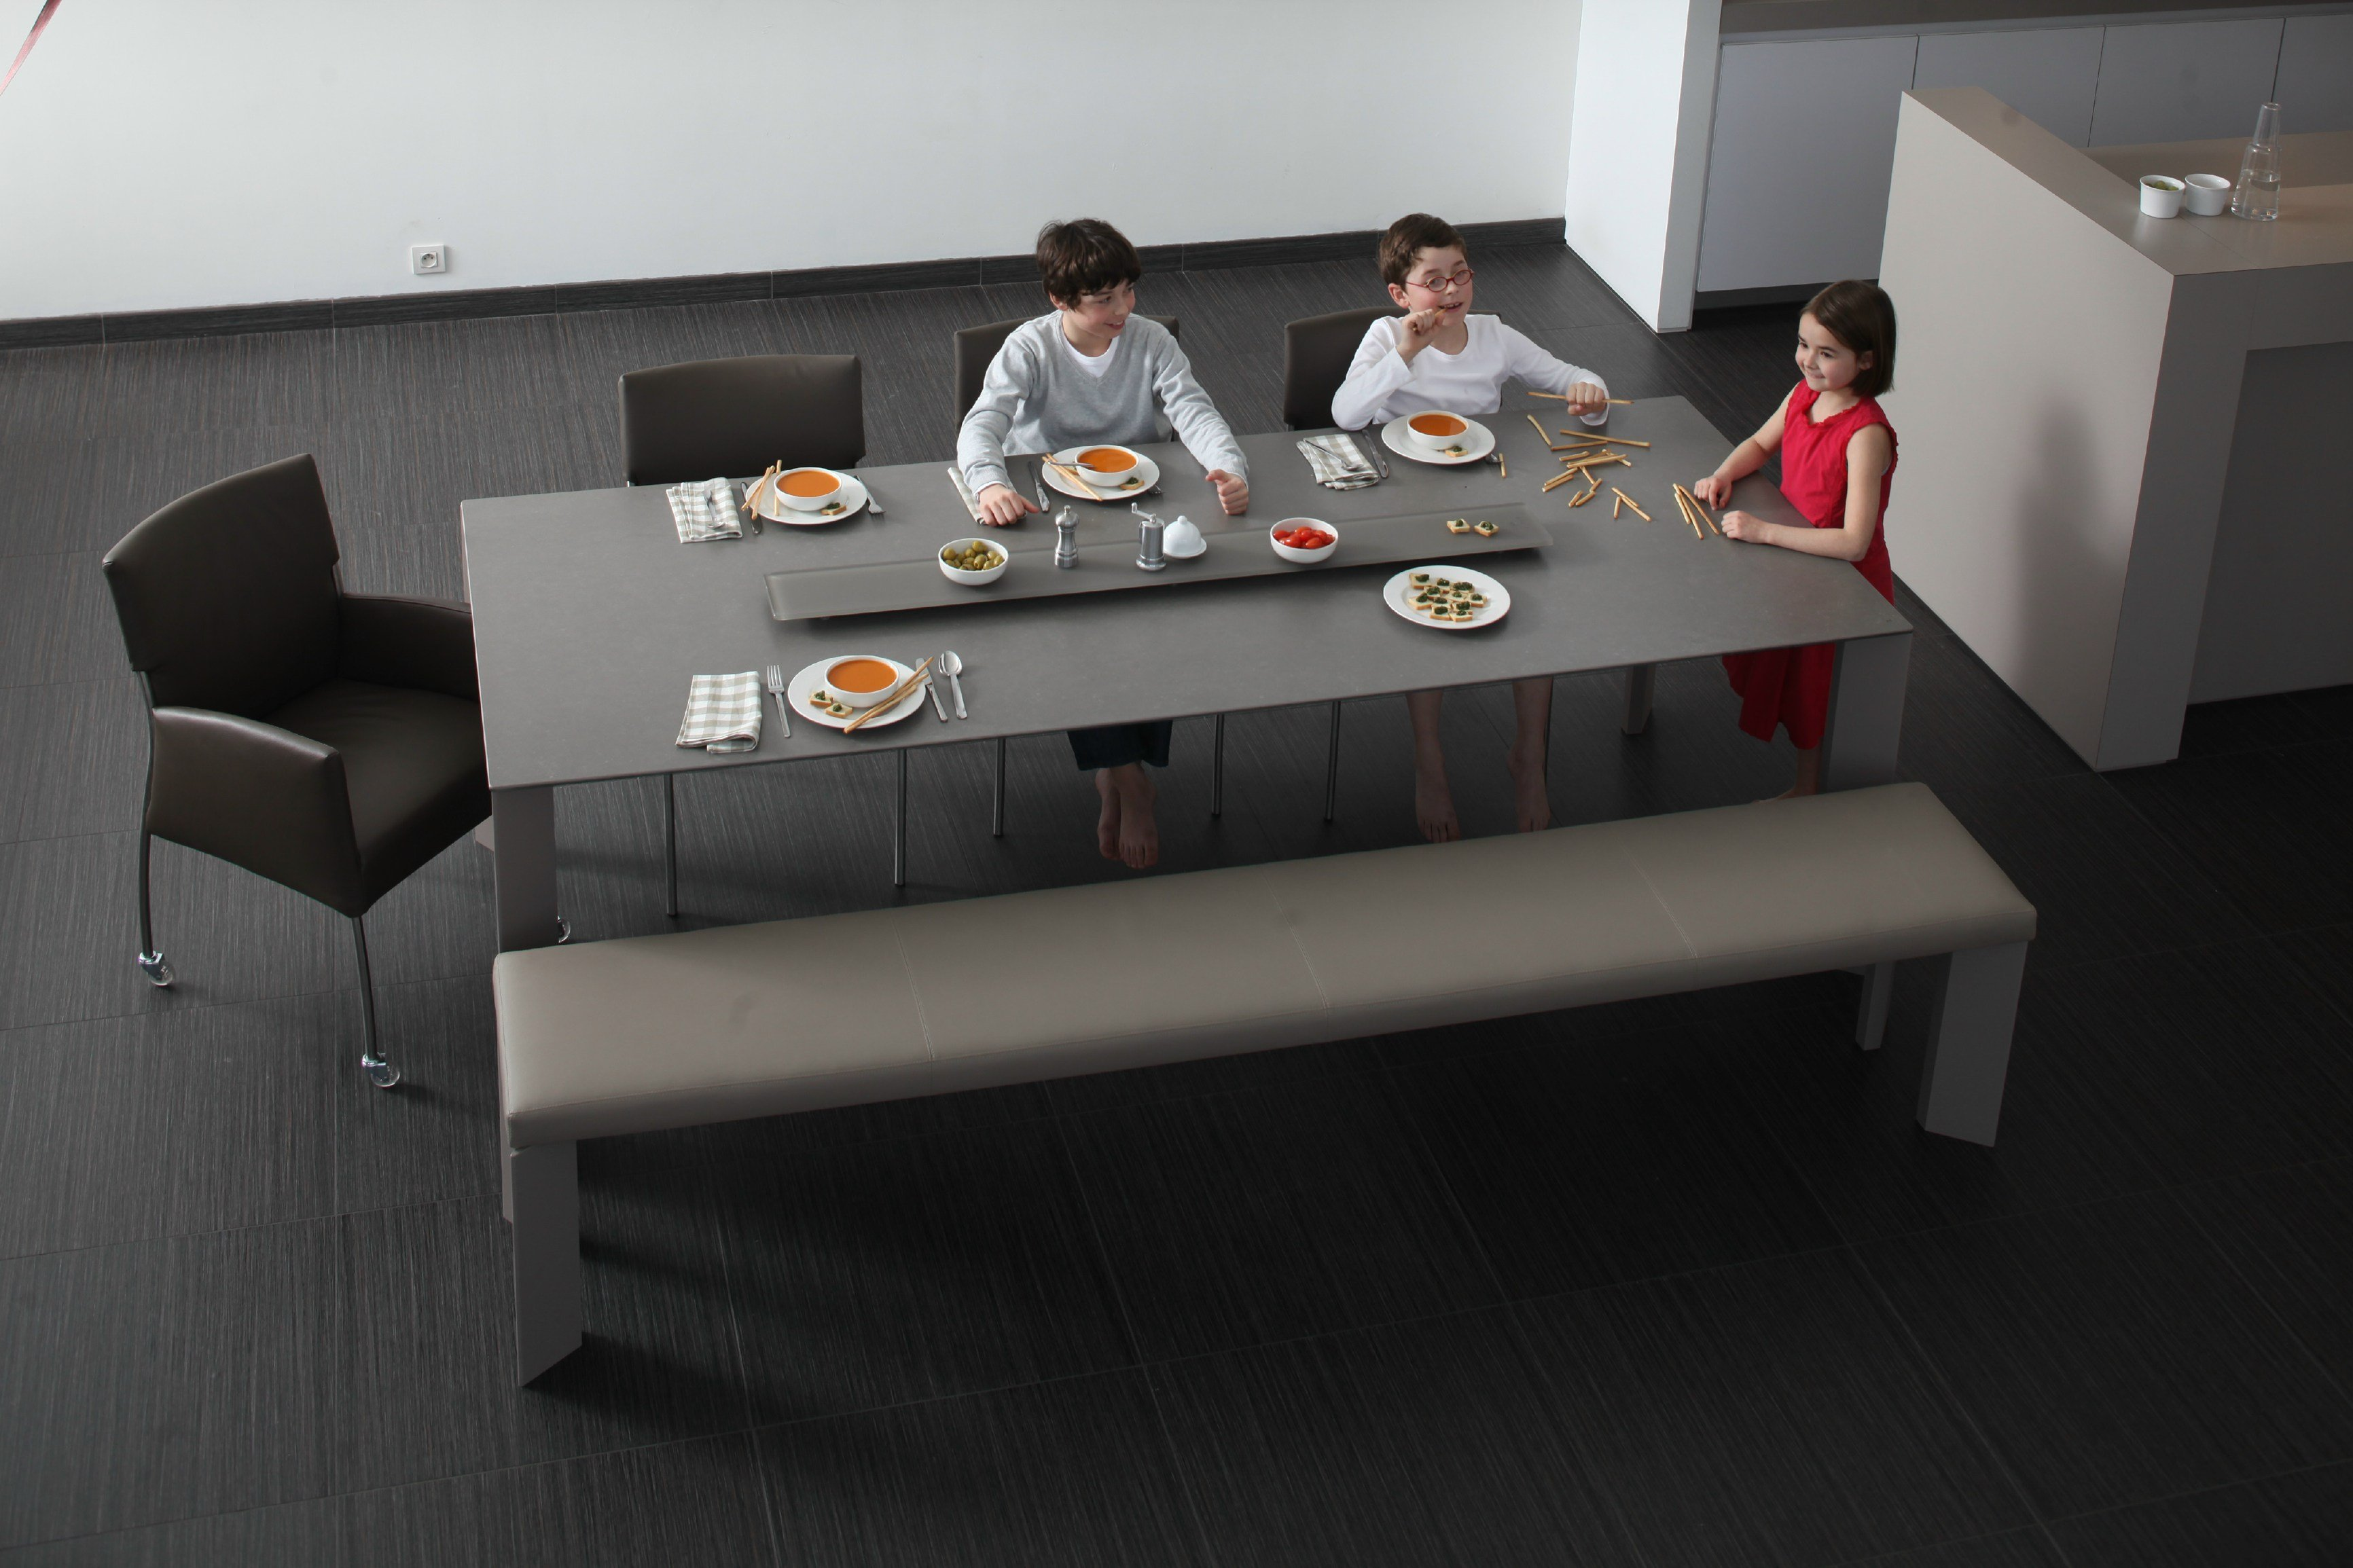 Panca per tavolo cucina: largo panca by joli design john ghekiere ...